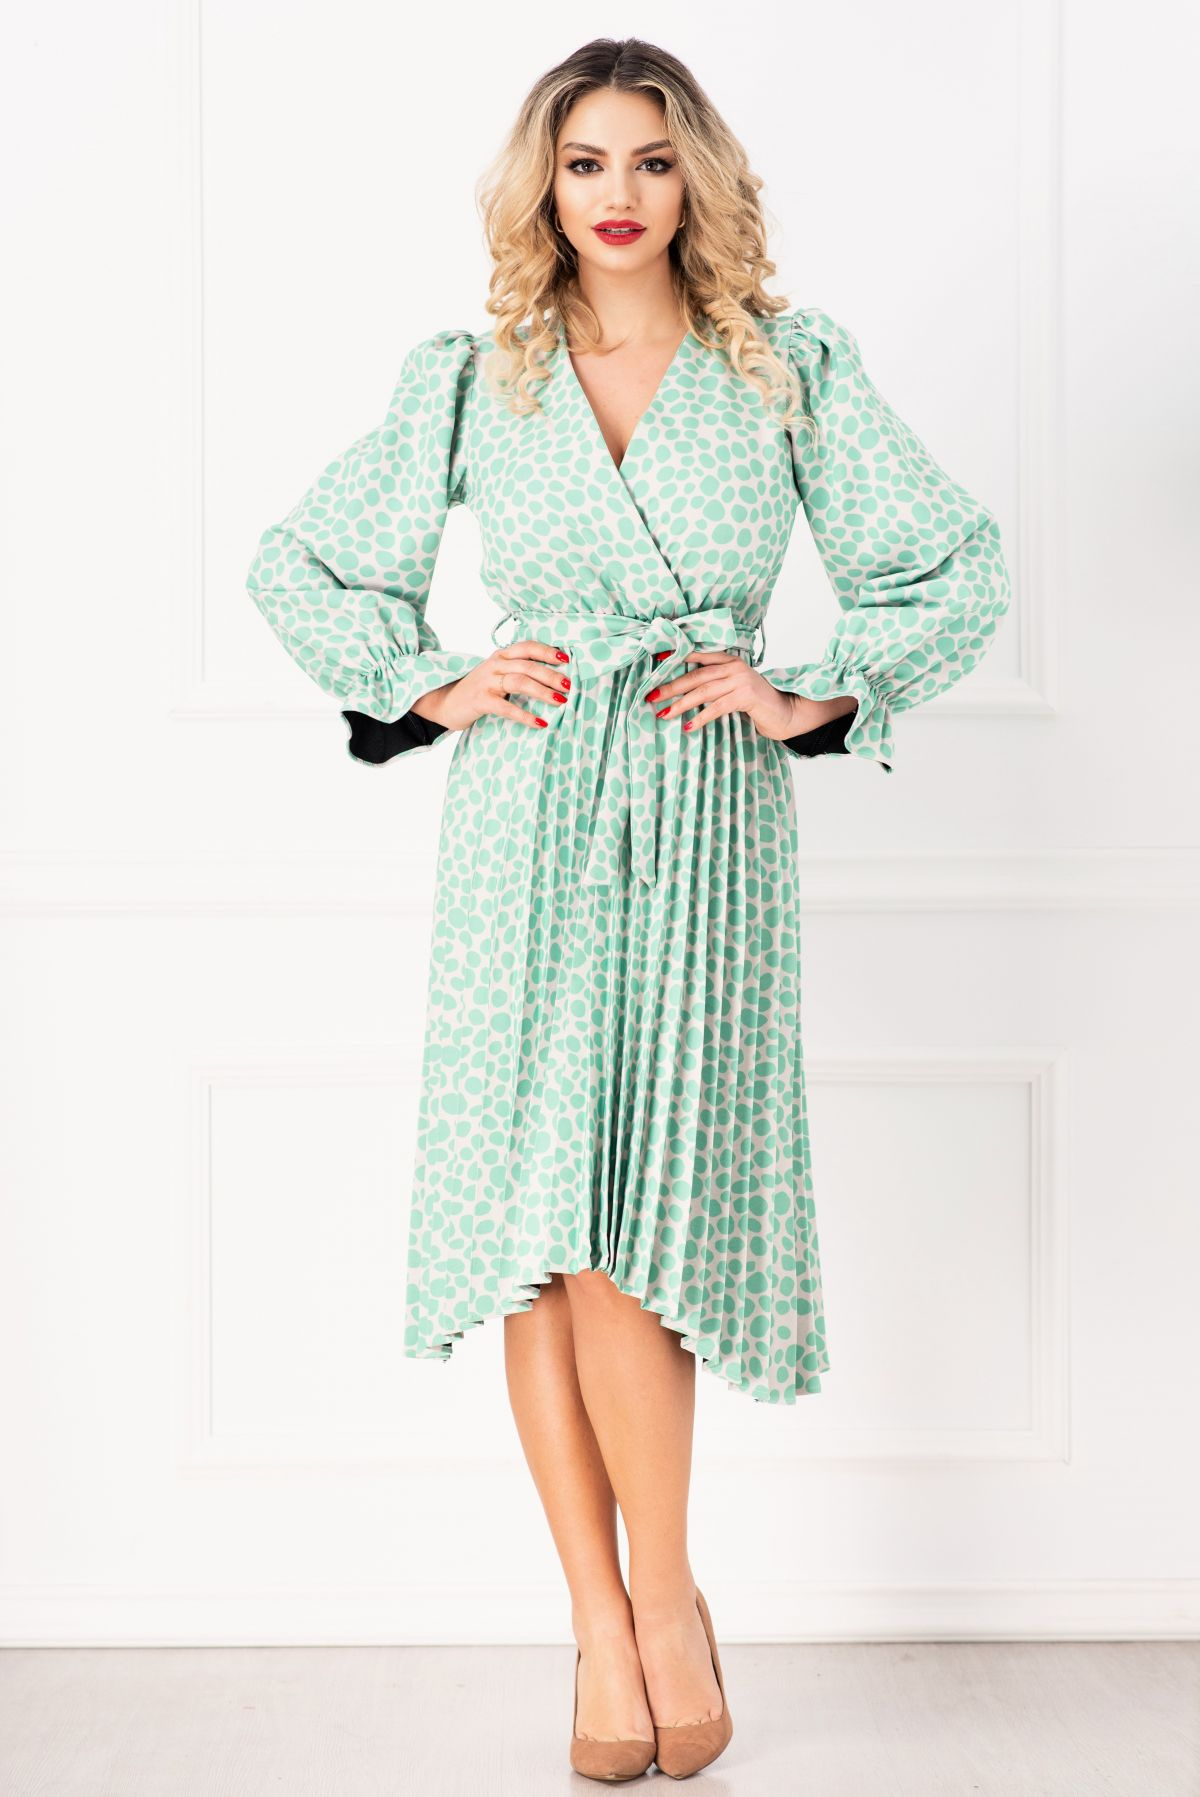 Rochie plisata cu imprimeu buline si bust petrecut